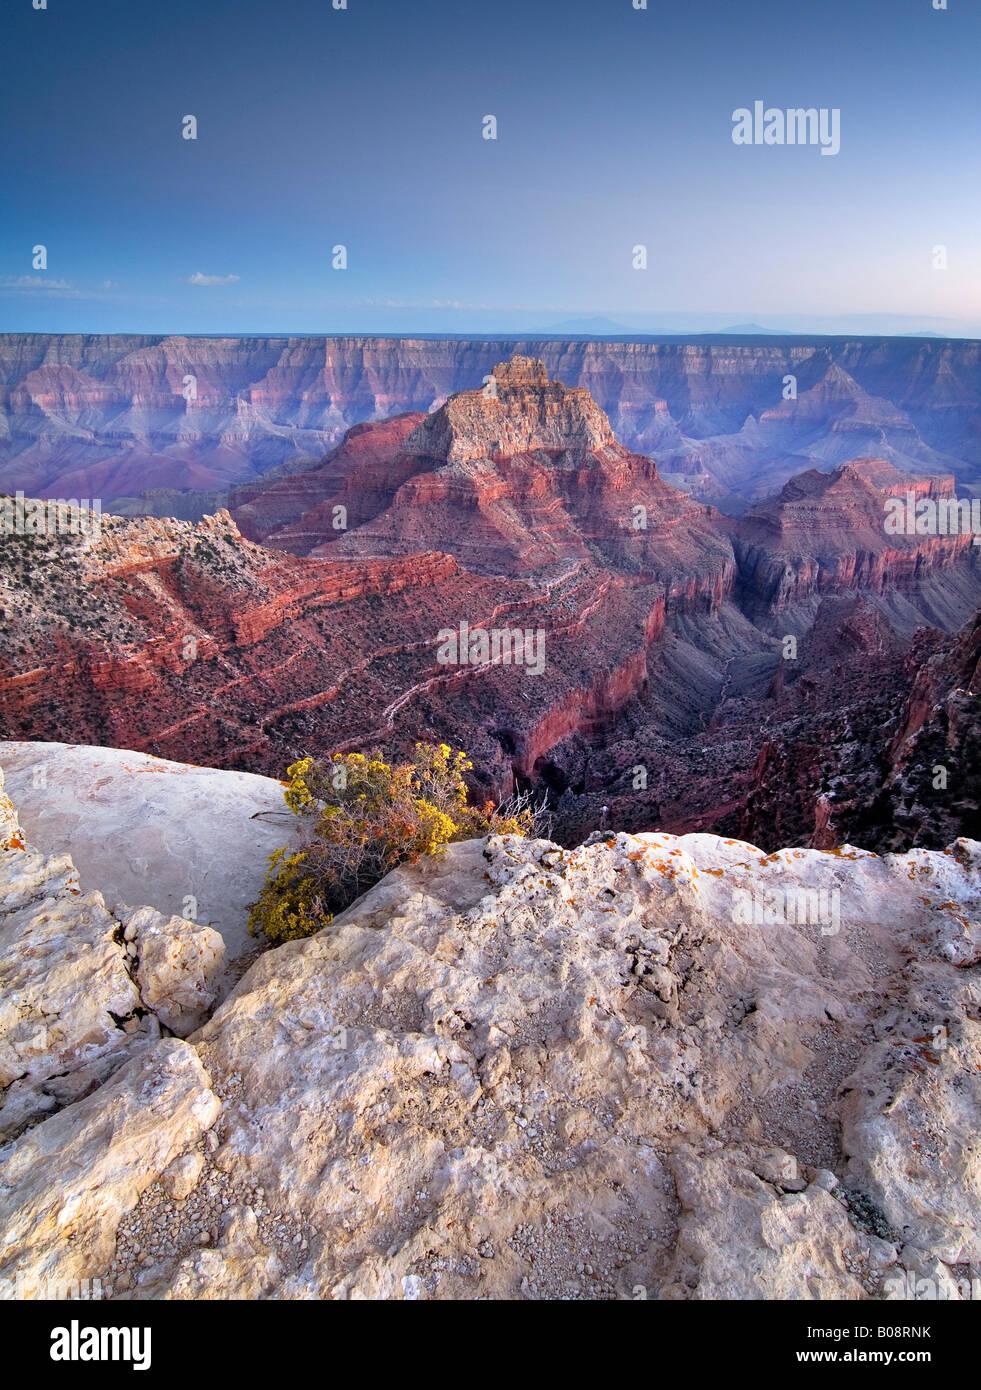 Cape Royal, North Rim, Grand Canyon National Park, Arizona, USA Stock Photo